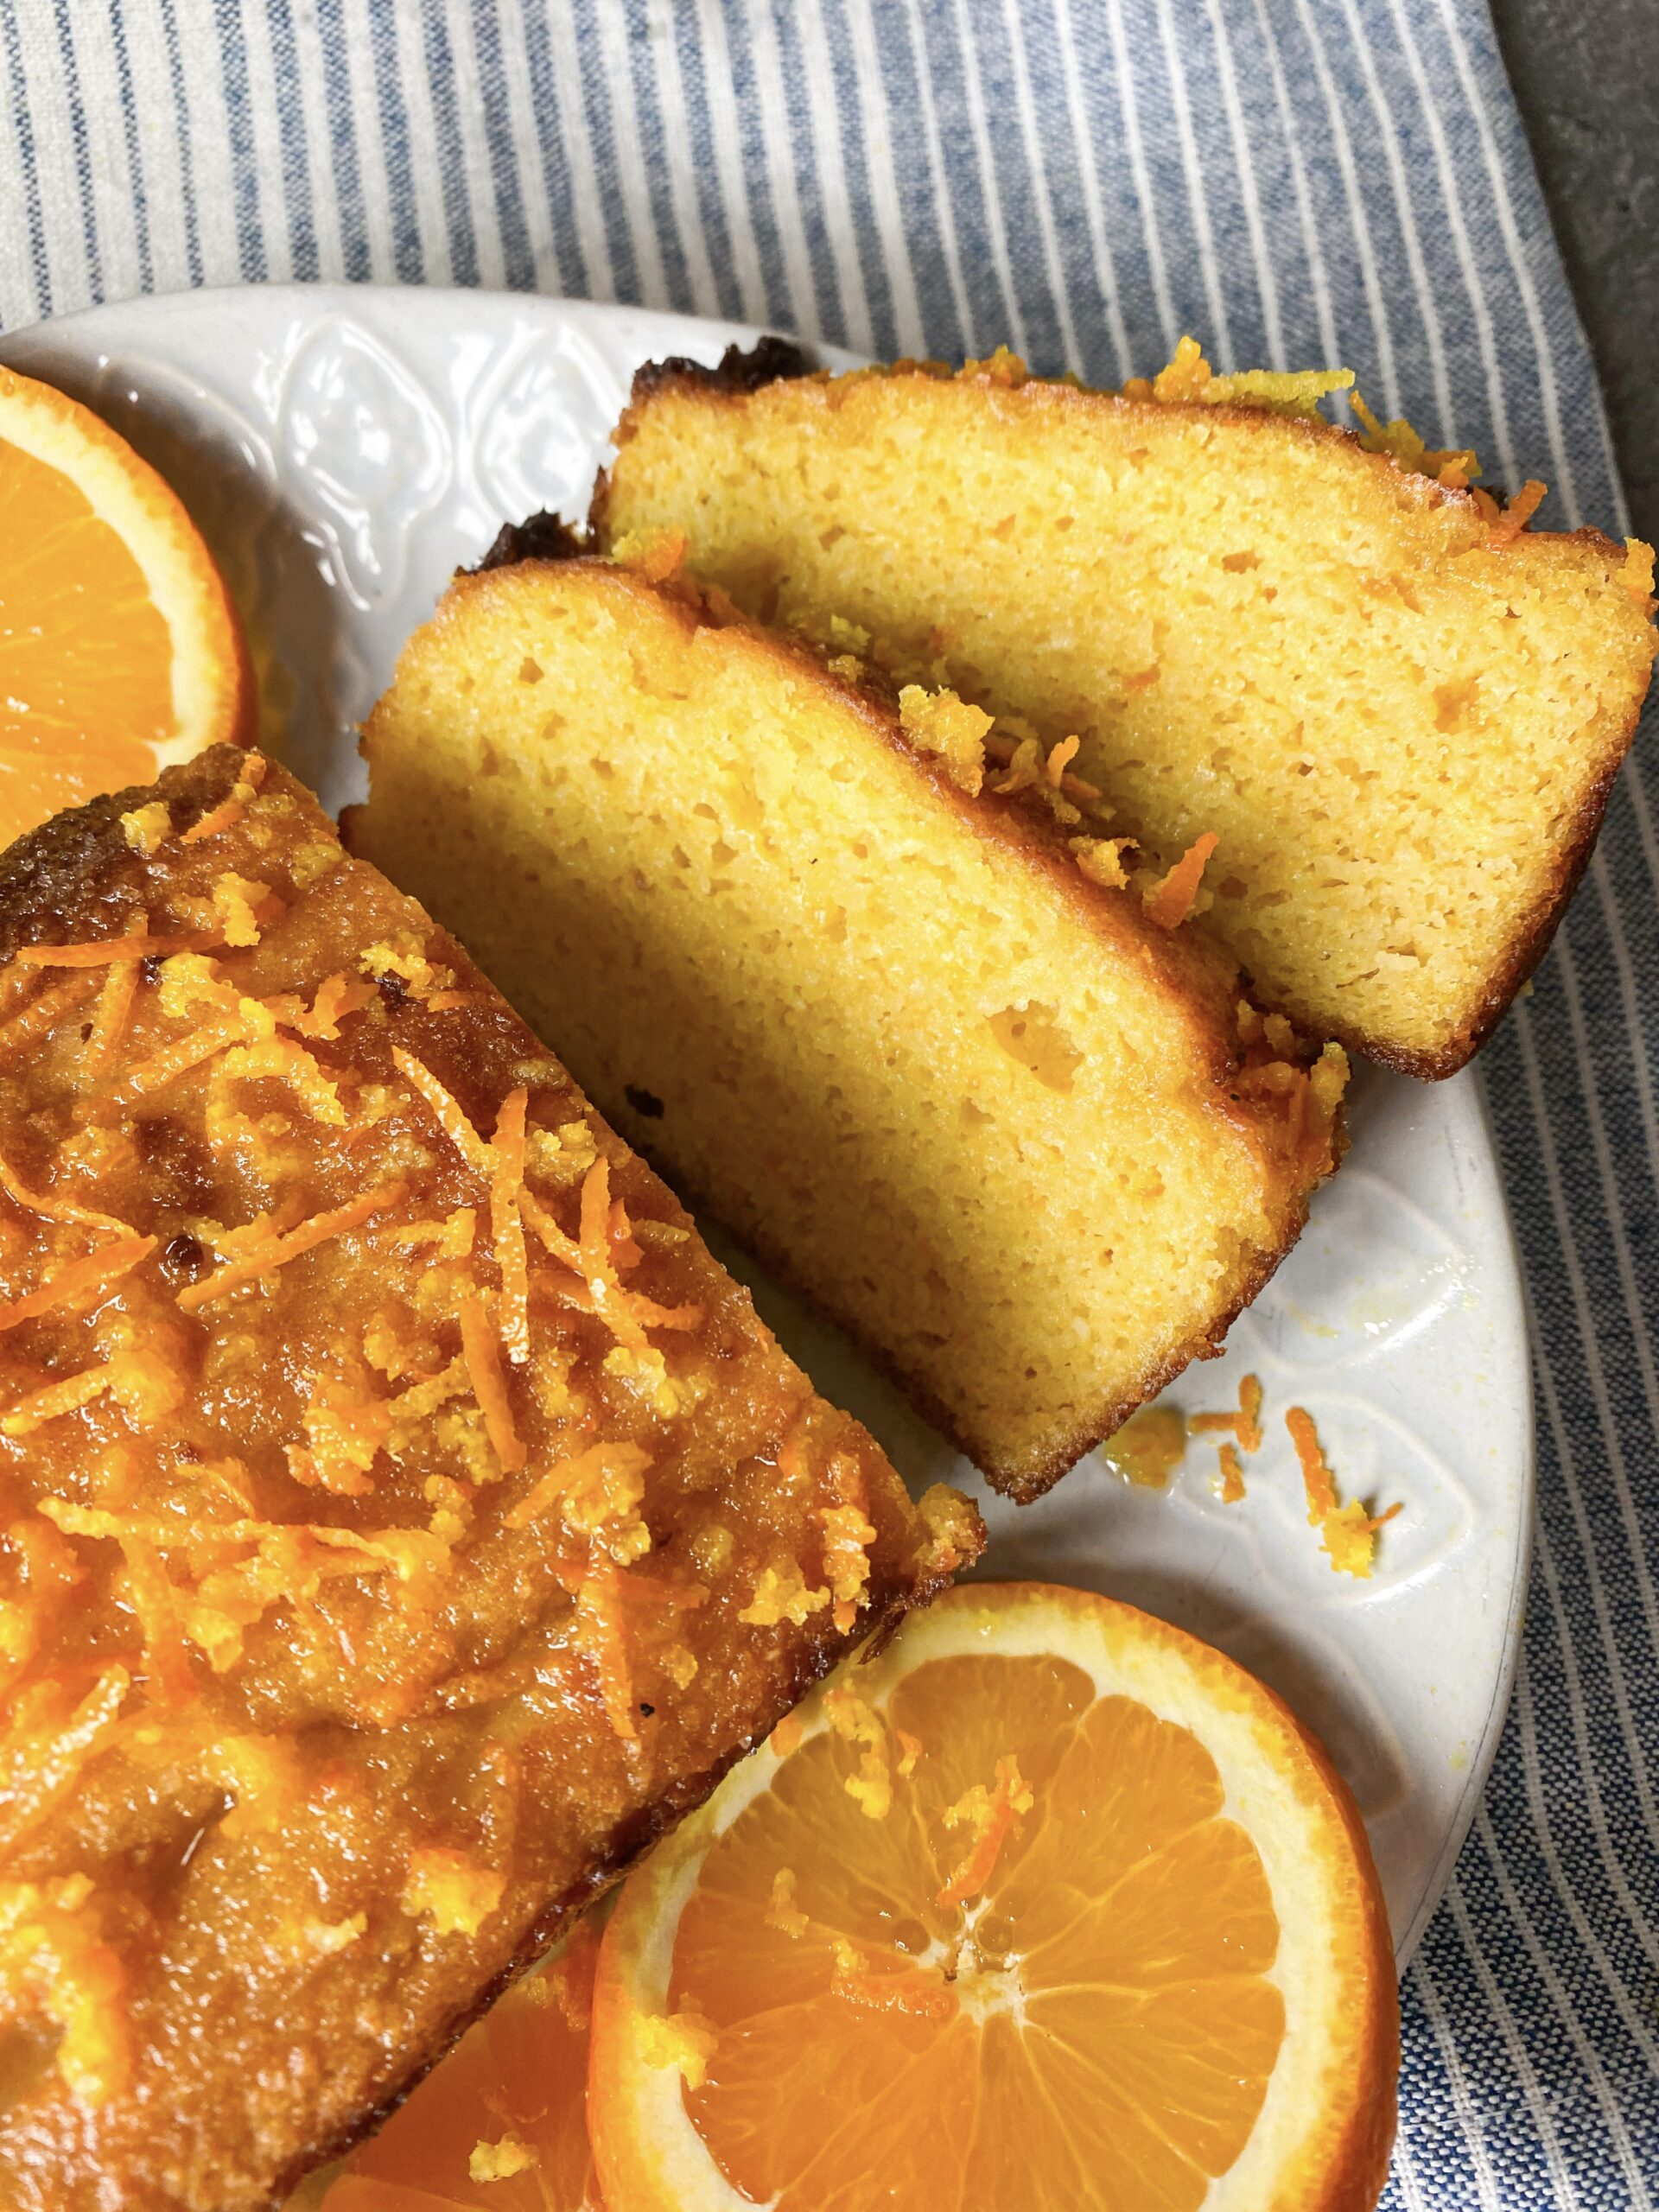 Picture of keto orange cake cut in slices